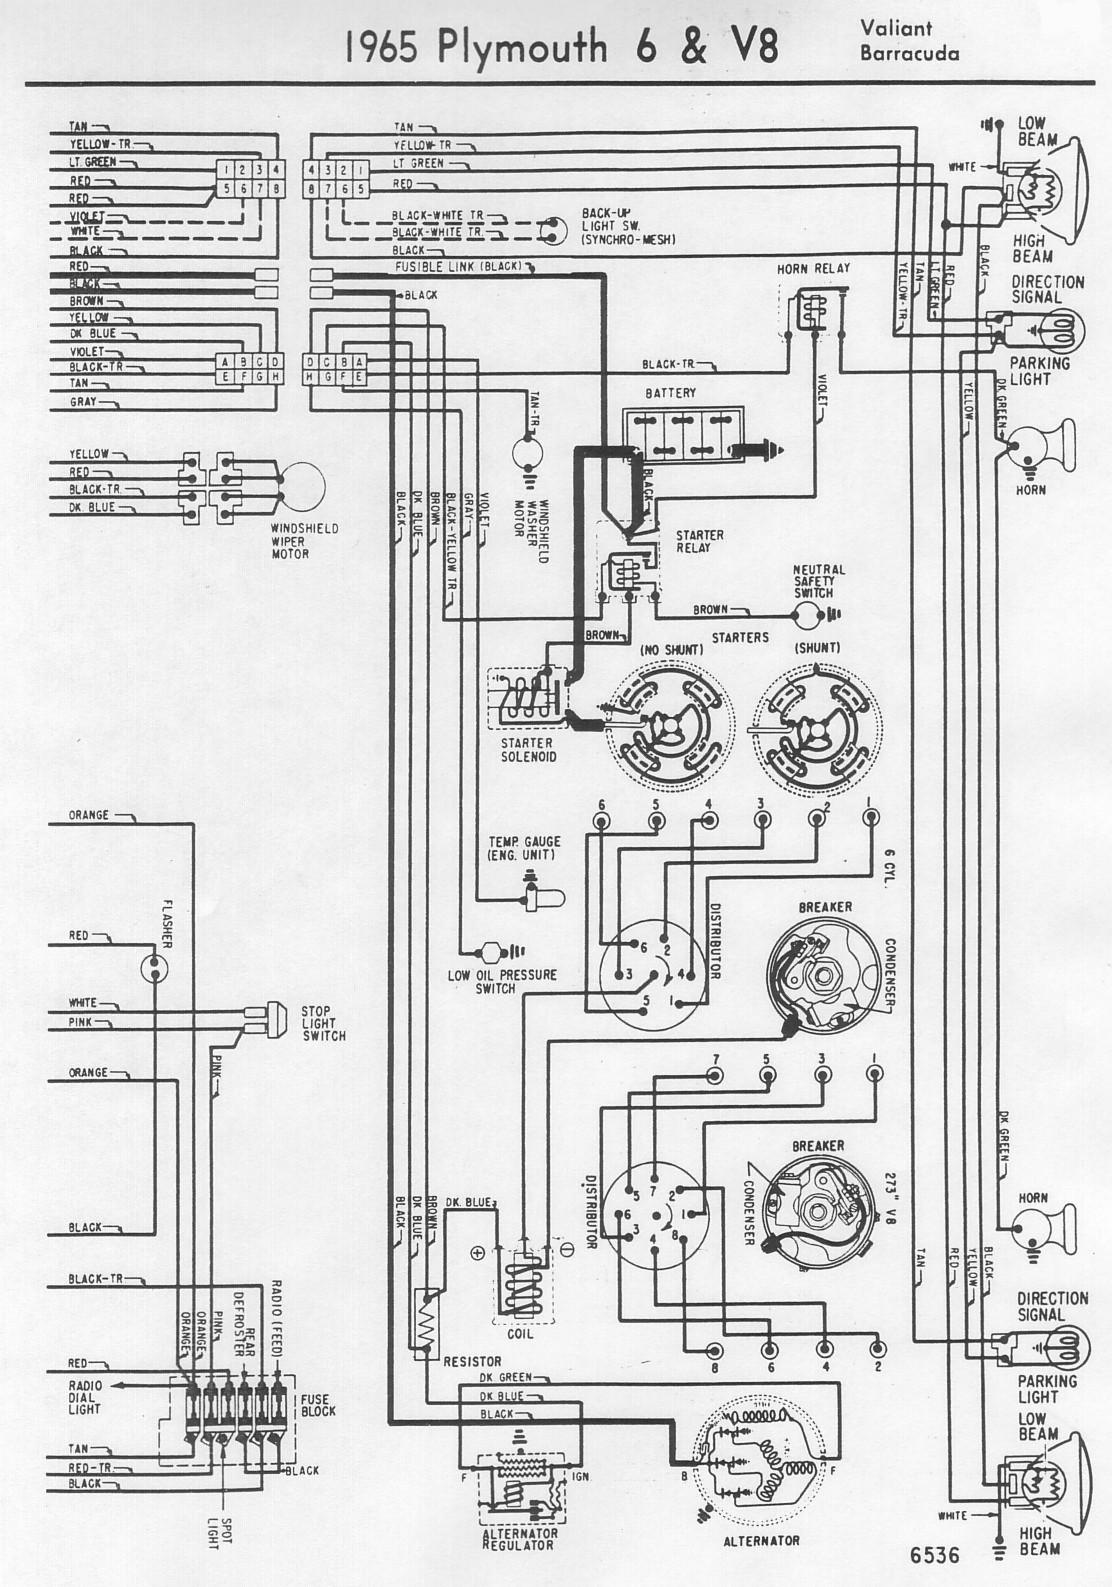 70 cuda wiper wiring diagram wiring diagram 1978 chevy truck wiring diagram 1973 cuda wiring diagram catalogue of